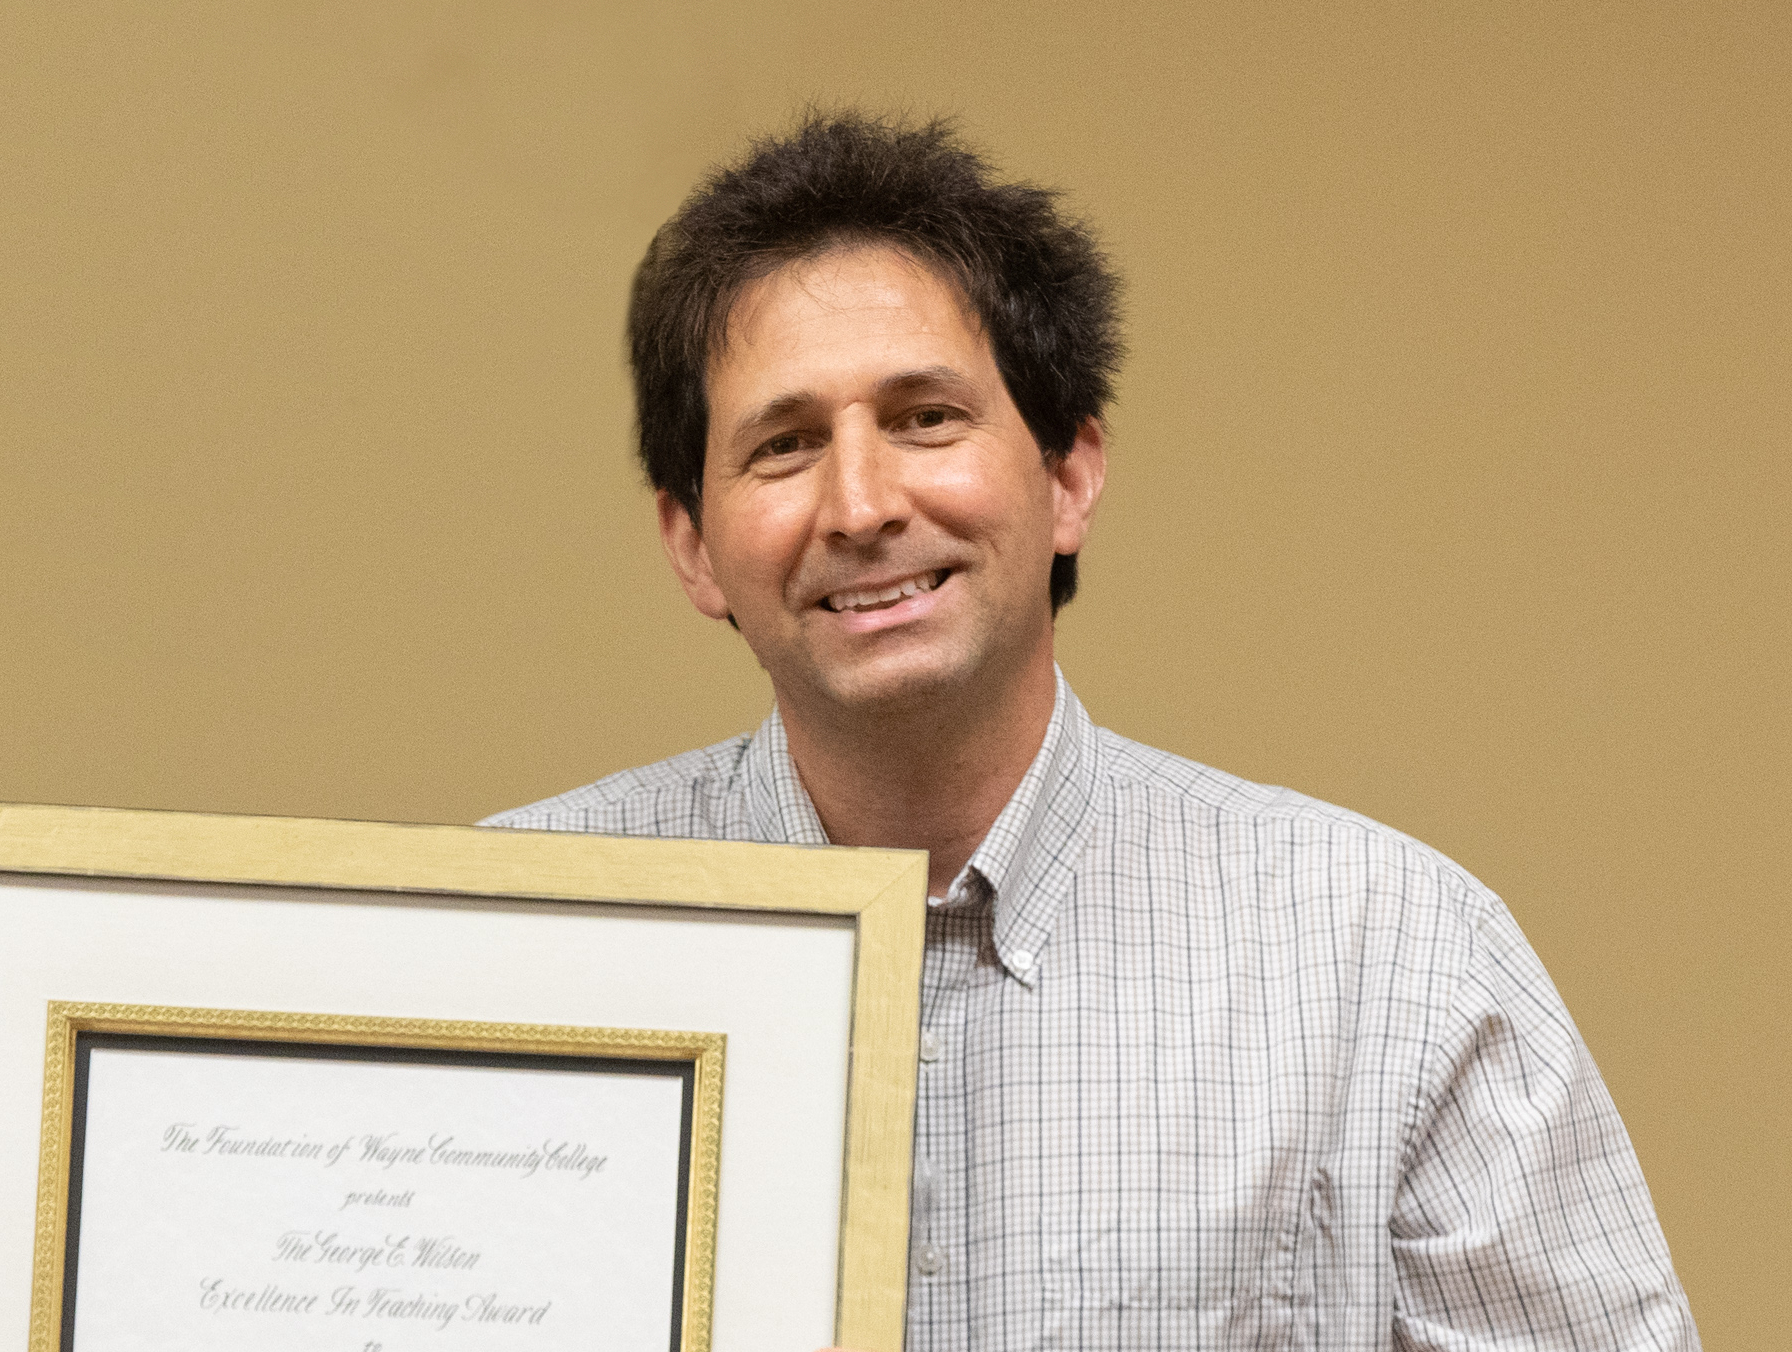 WCC's Lawson Receives Teaching Award